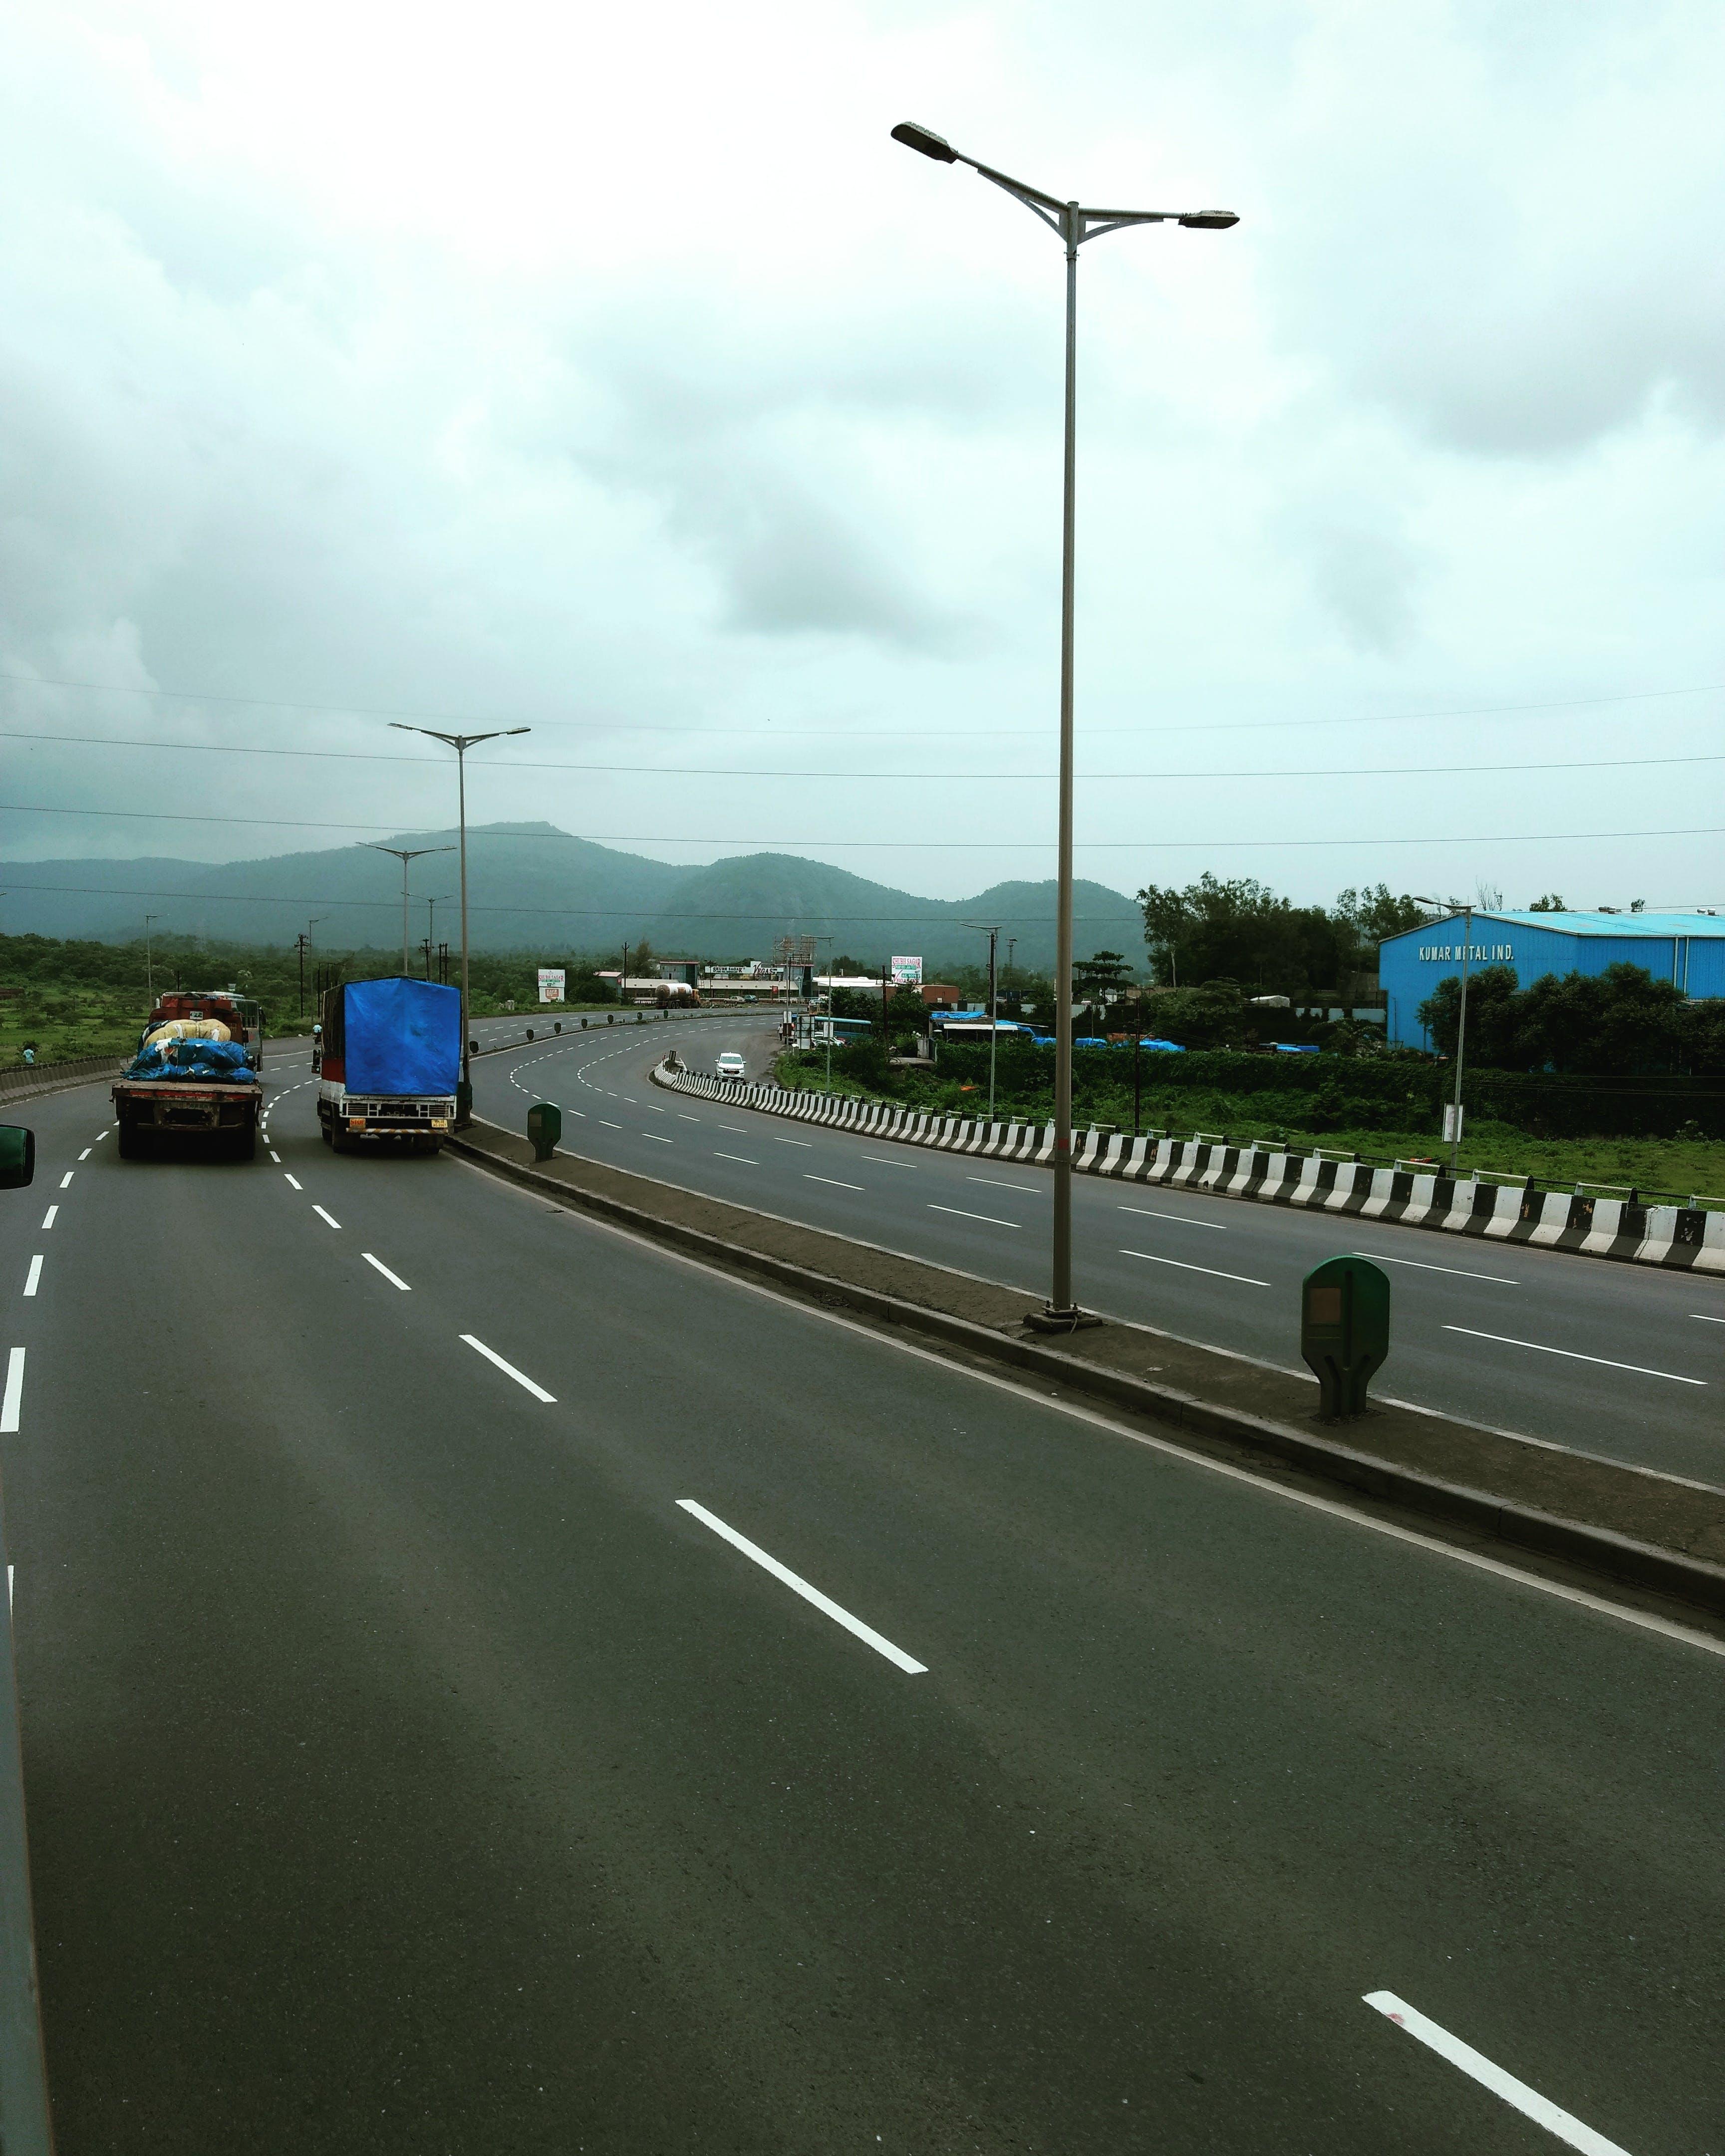 Free stock photo of • Highways •